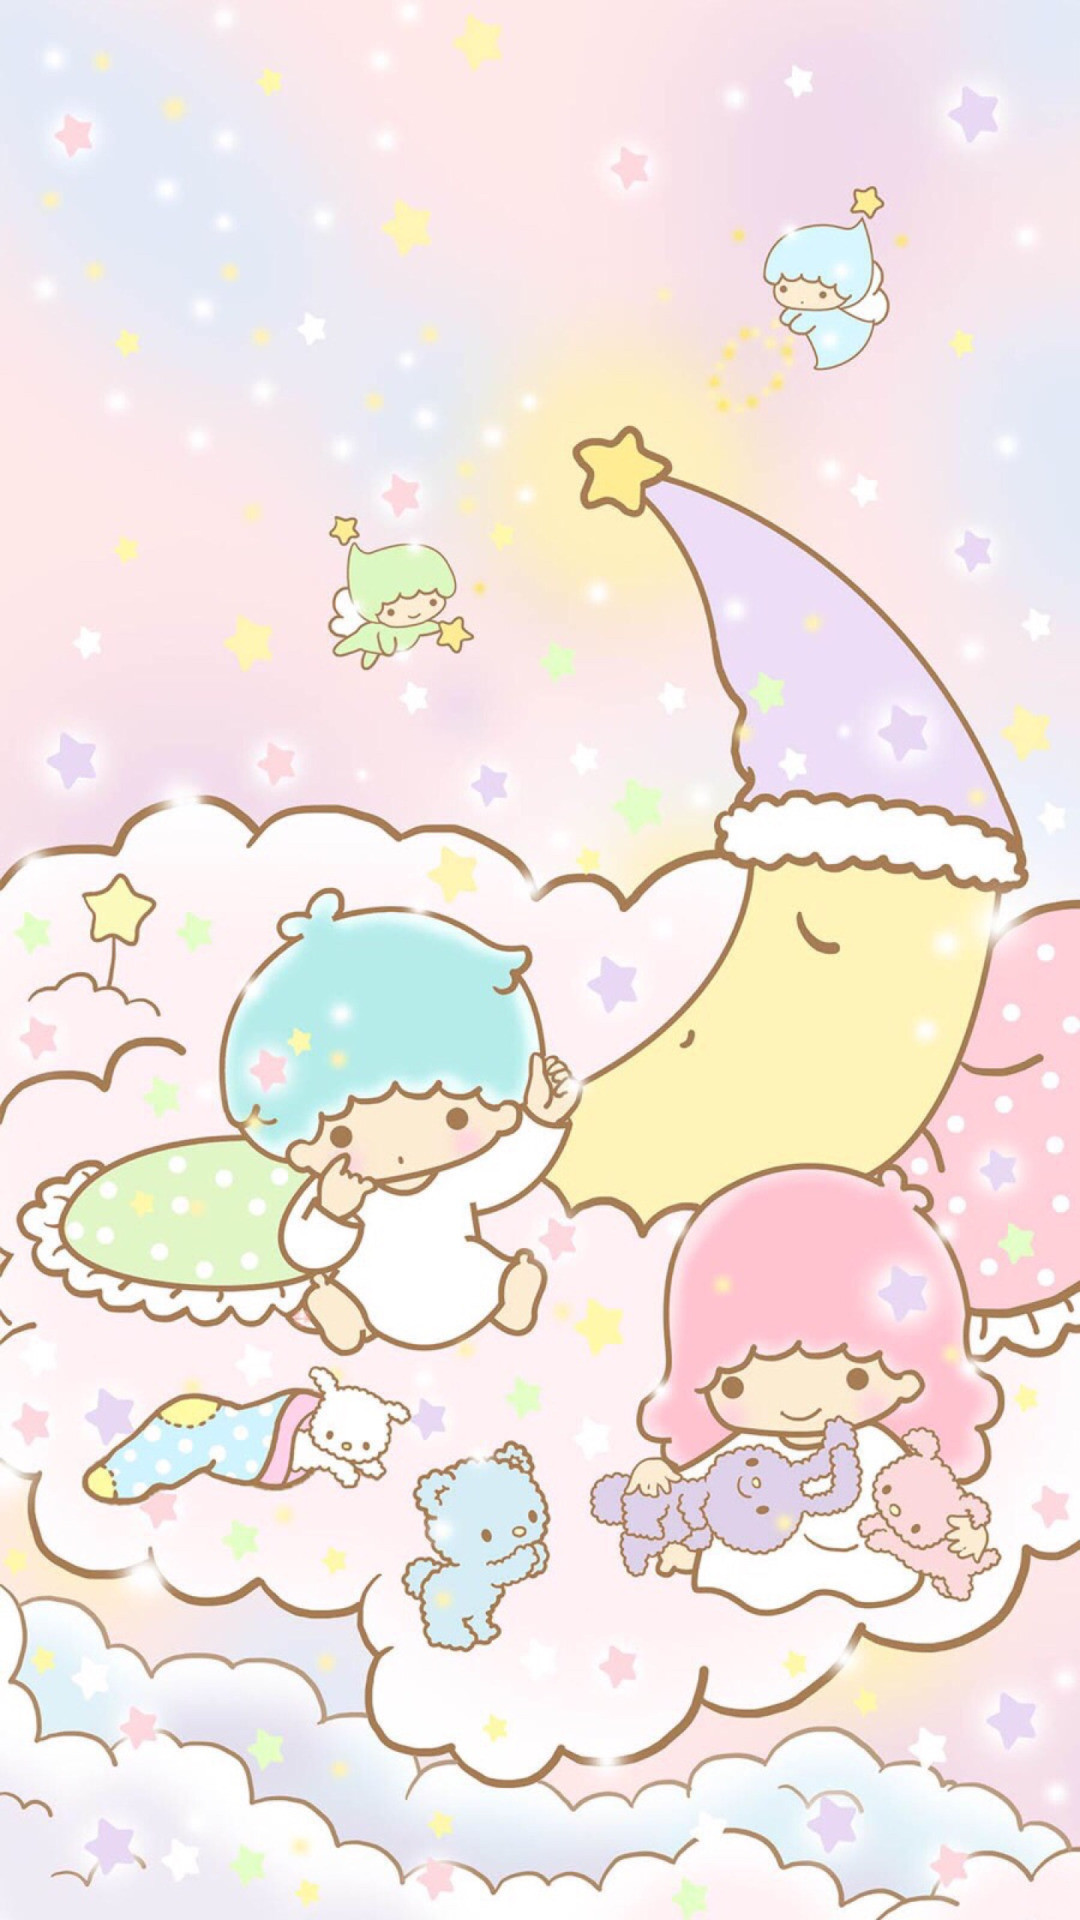 Sanrio Characters Wallpaper 68 Images